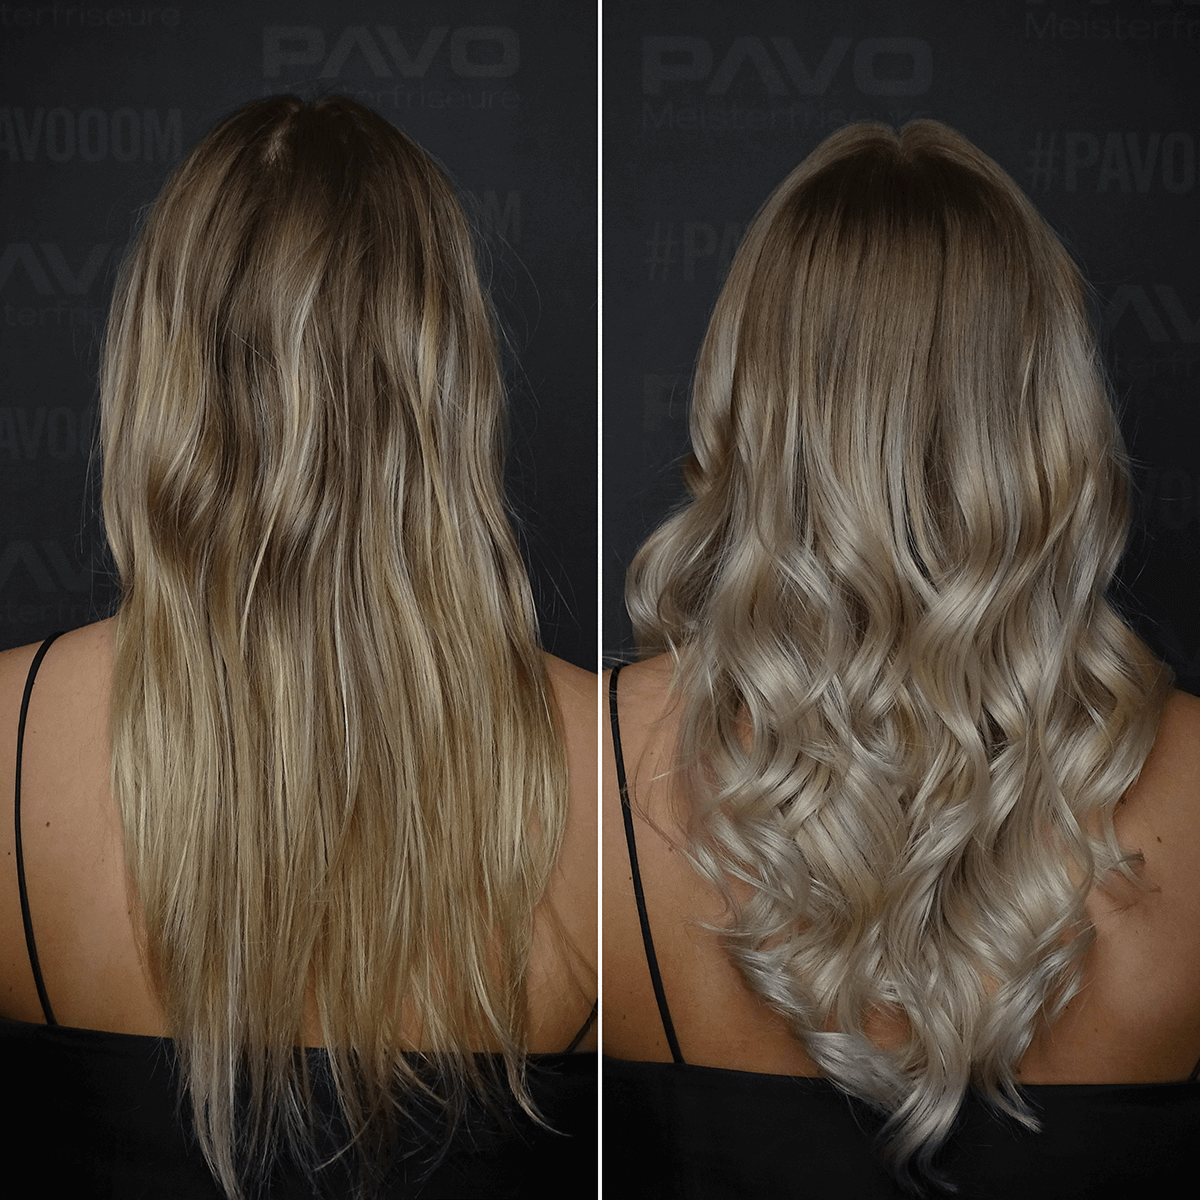 Guter Friseur In Essen Pavo Friseure Wer Liebt Kuhle Blondtone